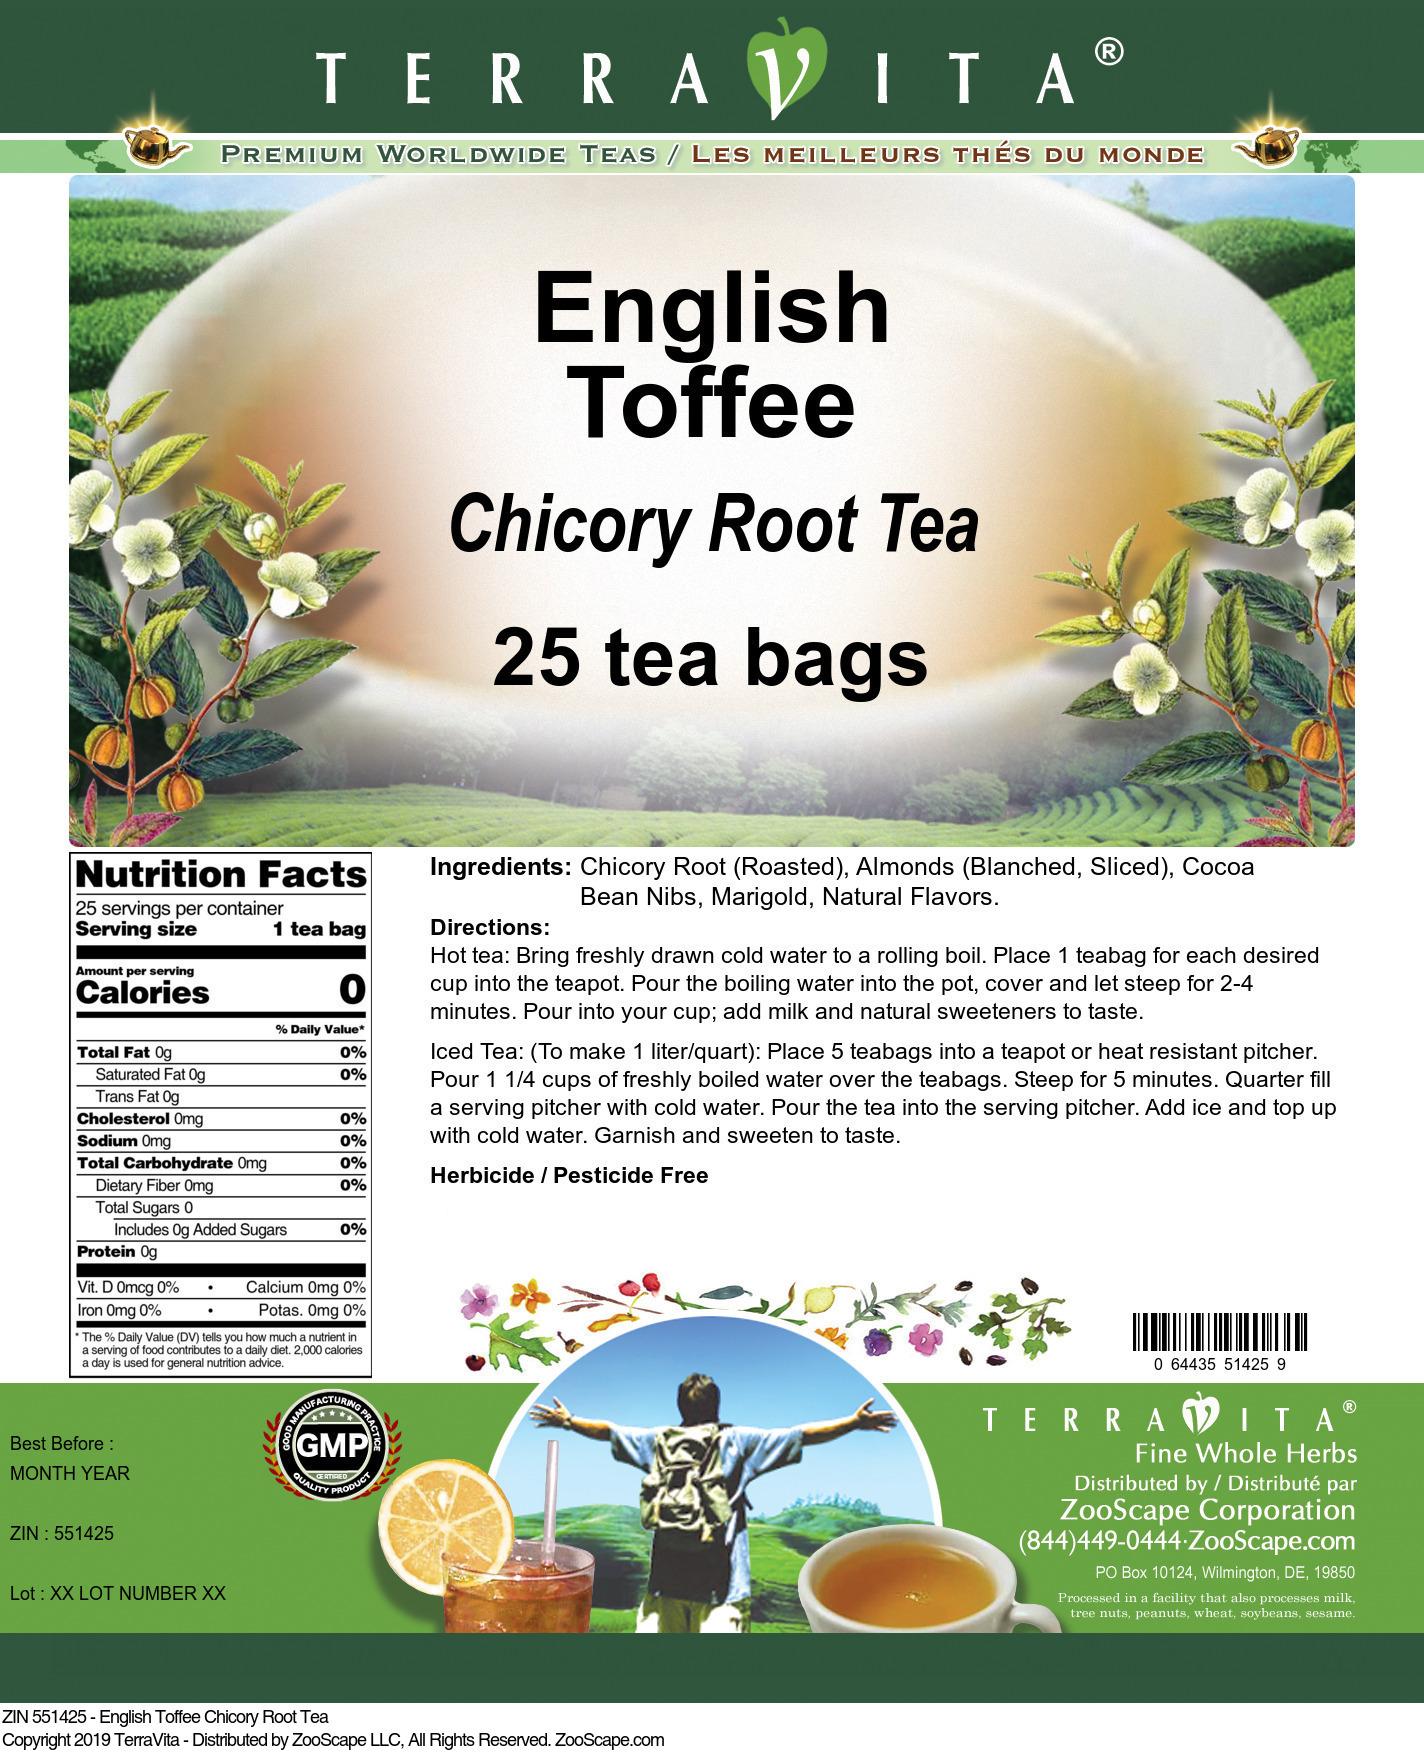 English Toffee Chicory Root Tea